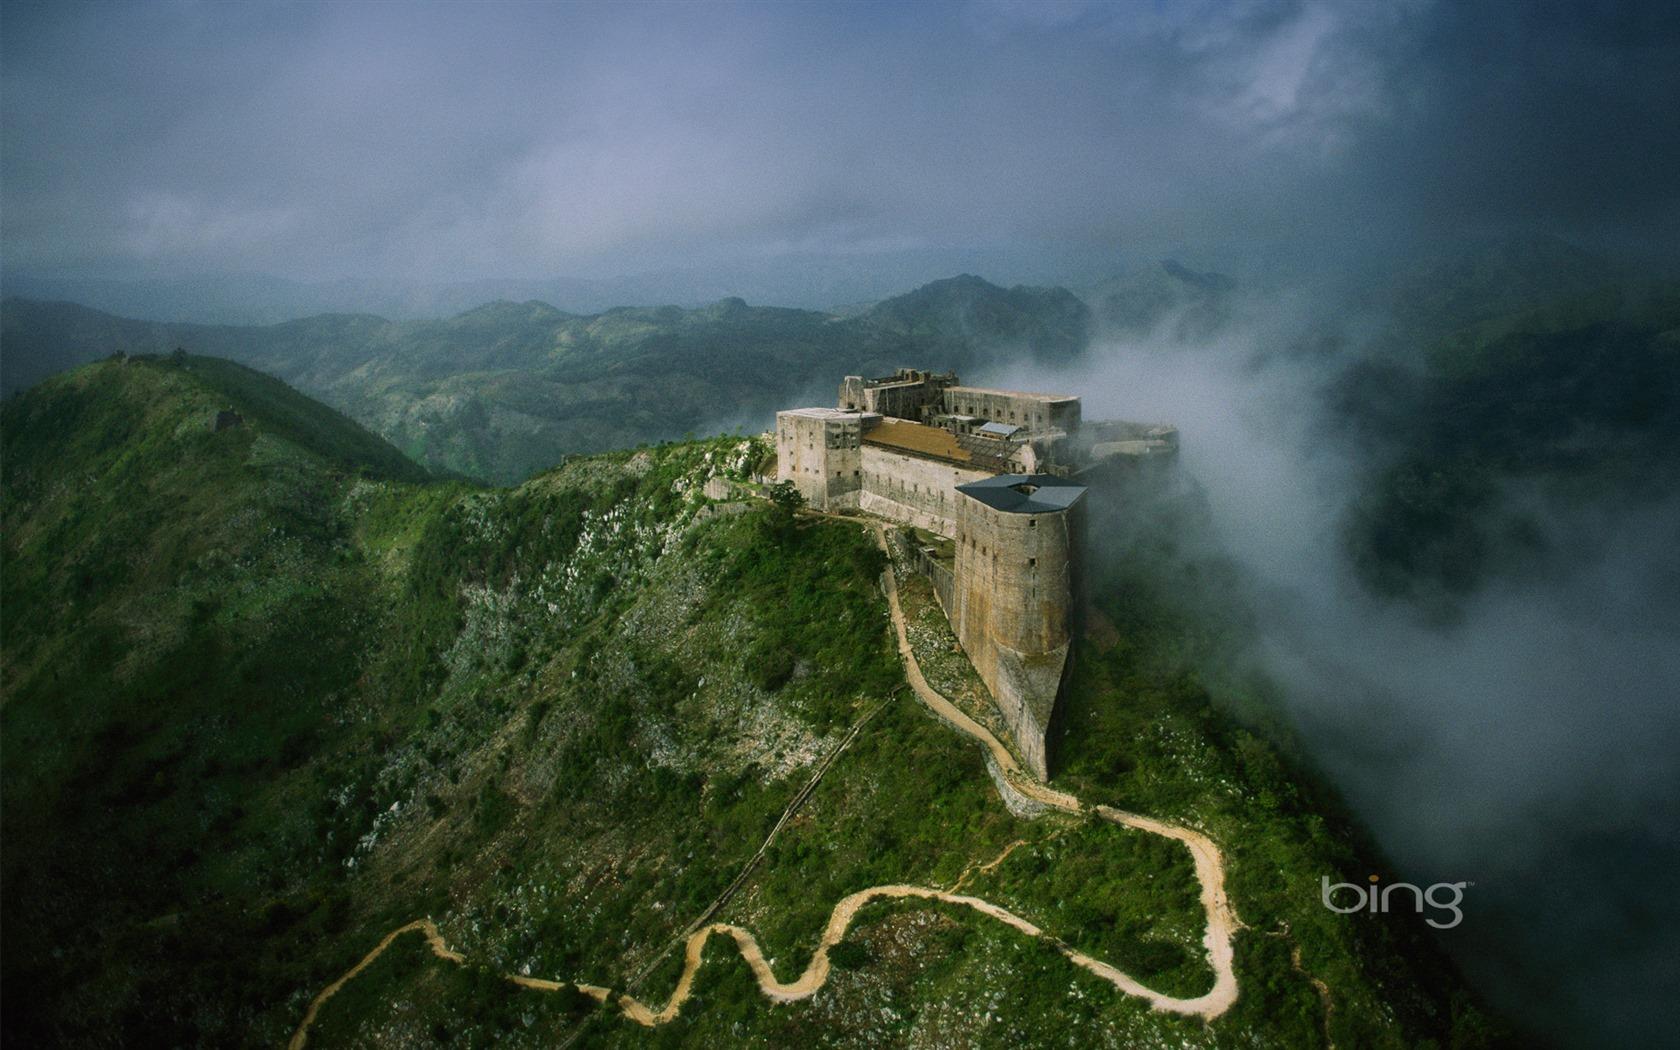 Bing Themes mountains castles widescreen HD wallpaper   1680x1050 1680x1050